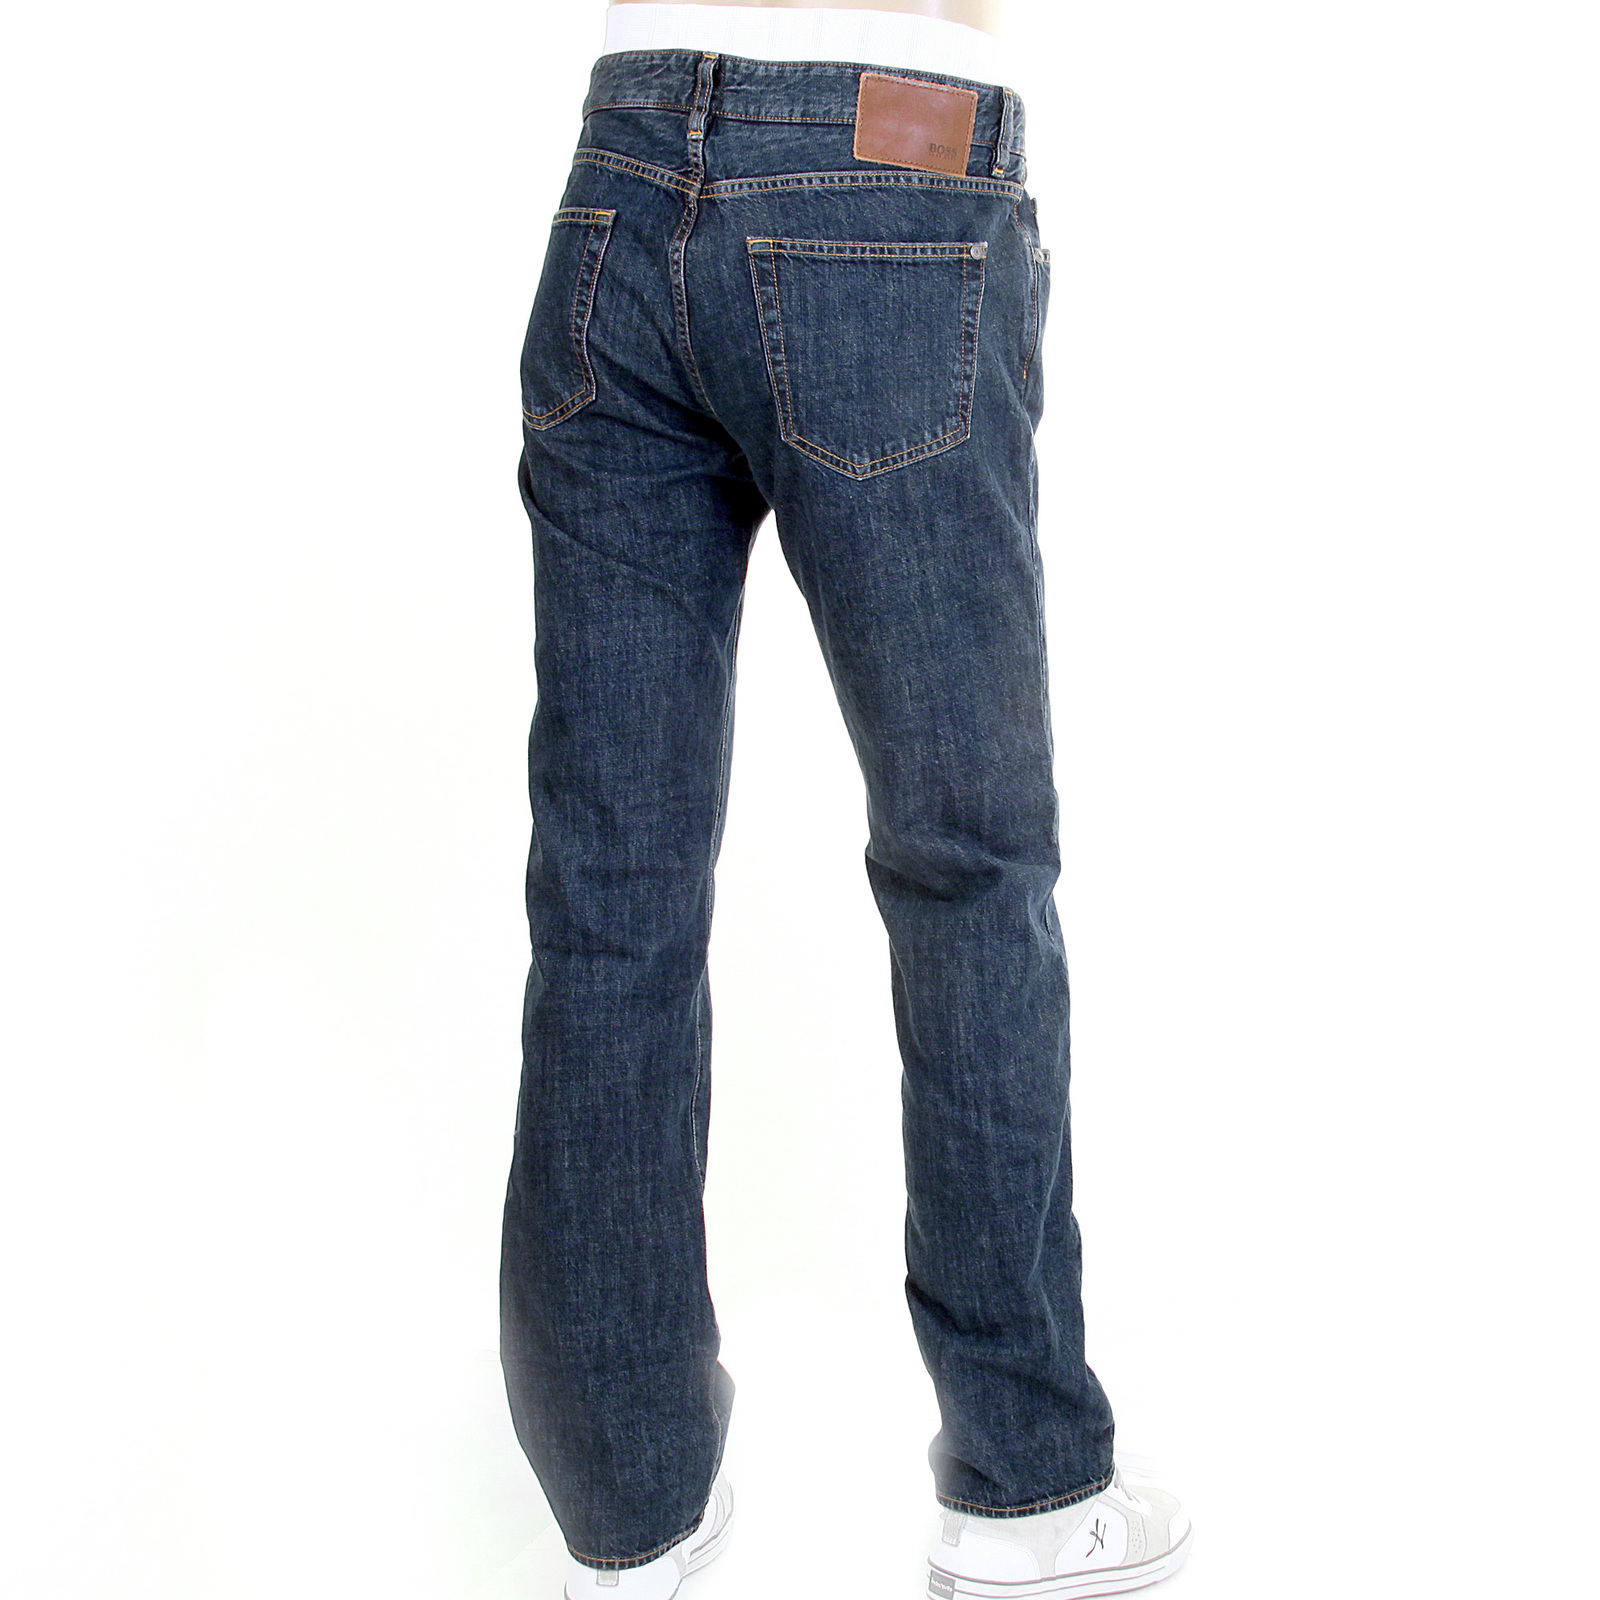 big sale stable quality exquisite style Boss Black jeans Kansas 50211387 classic dark wash Hugo Boss denim jean  BOSS0737